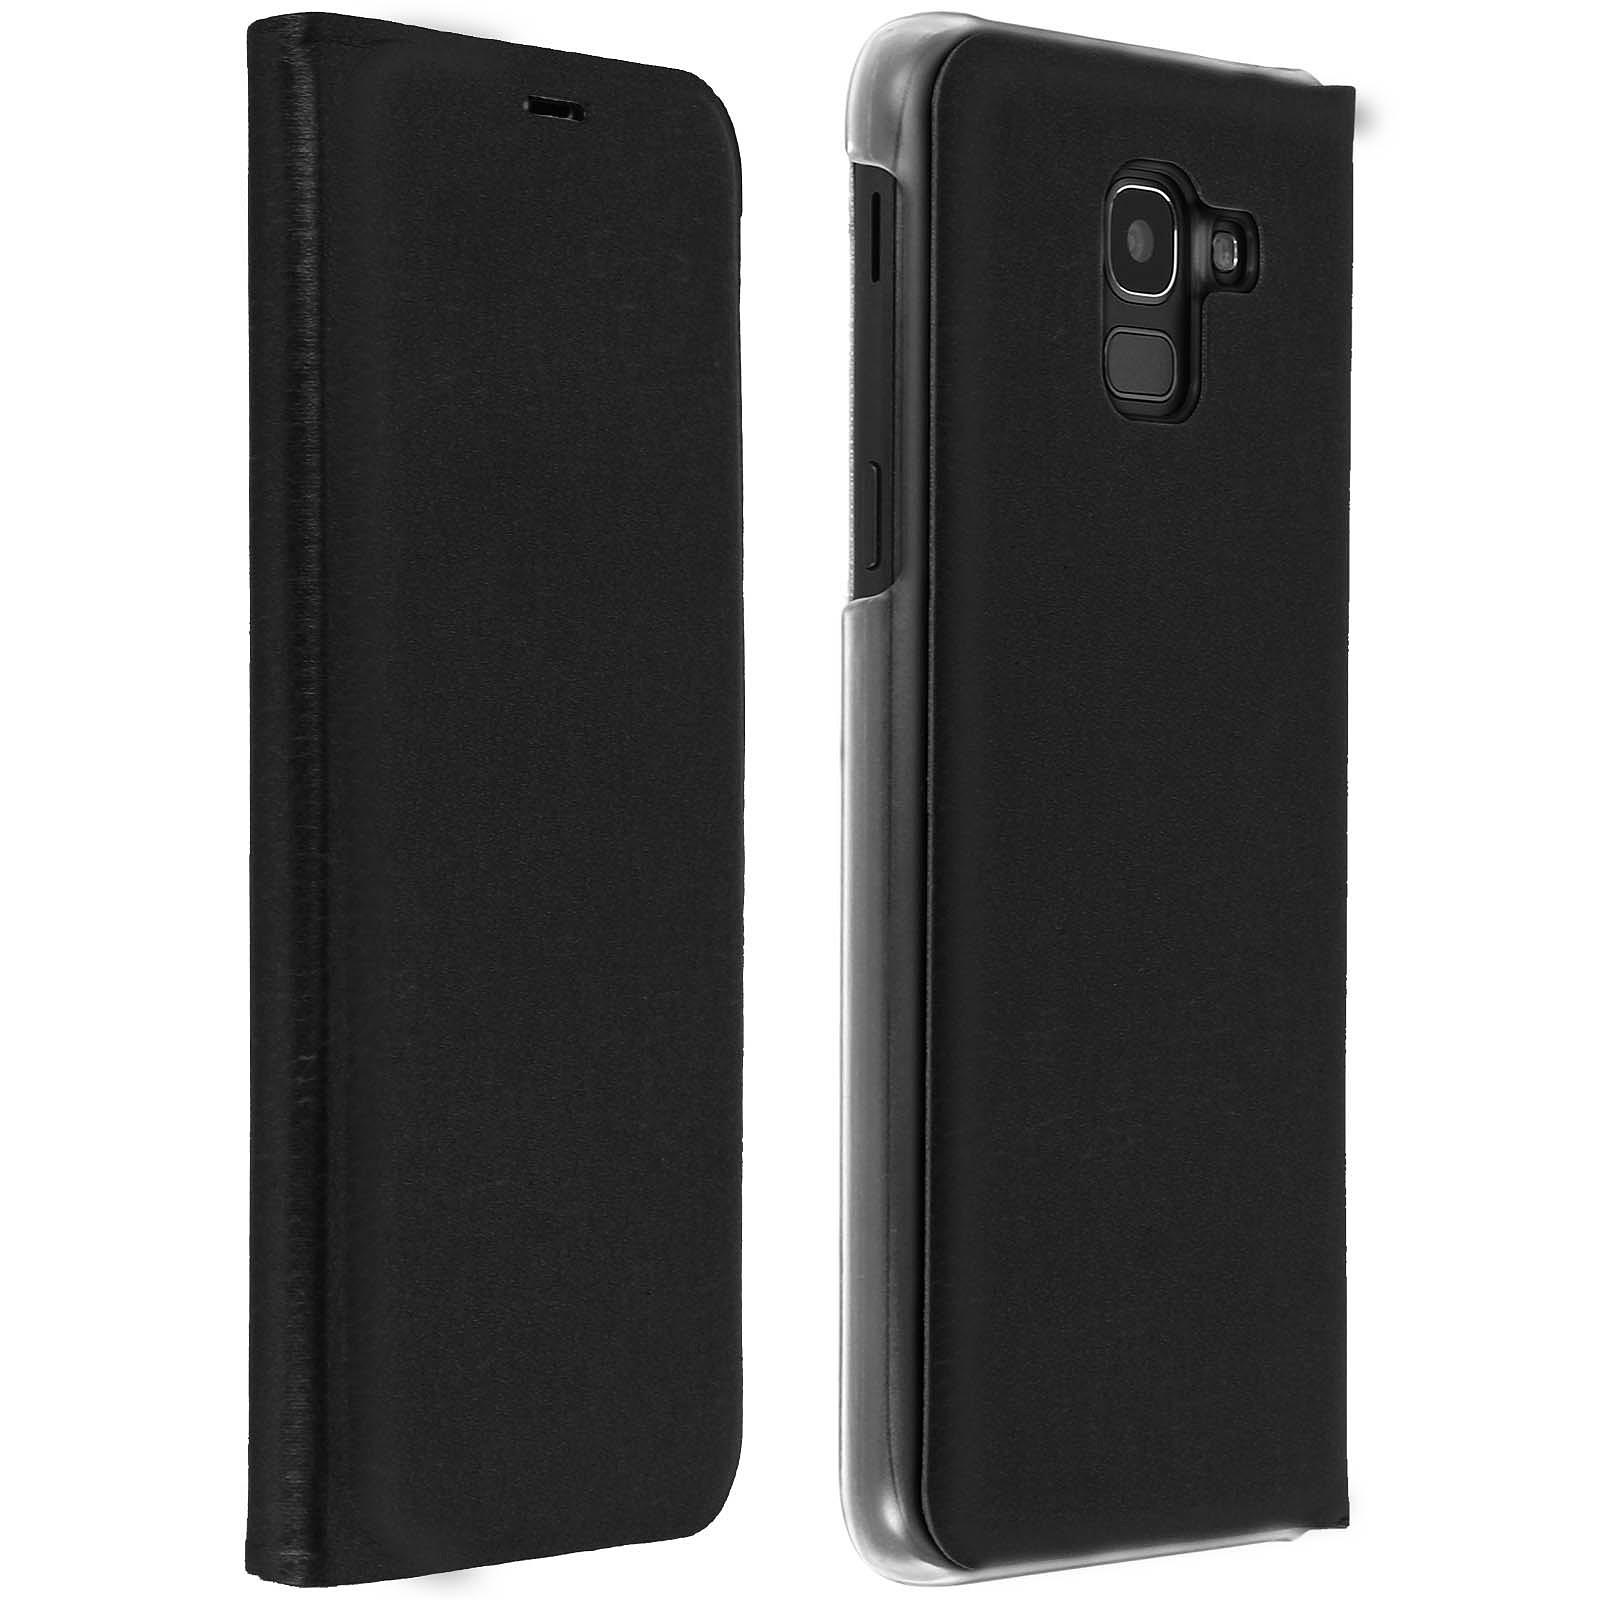 Avizar Etui folio Noir pour Samsung Galaxy J6